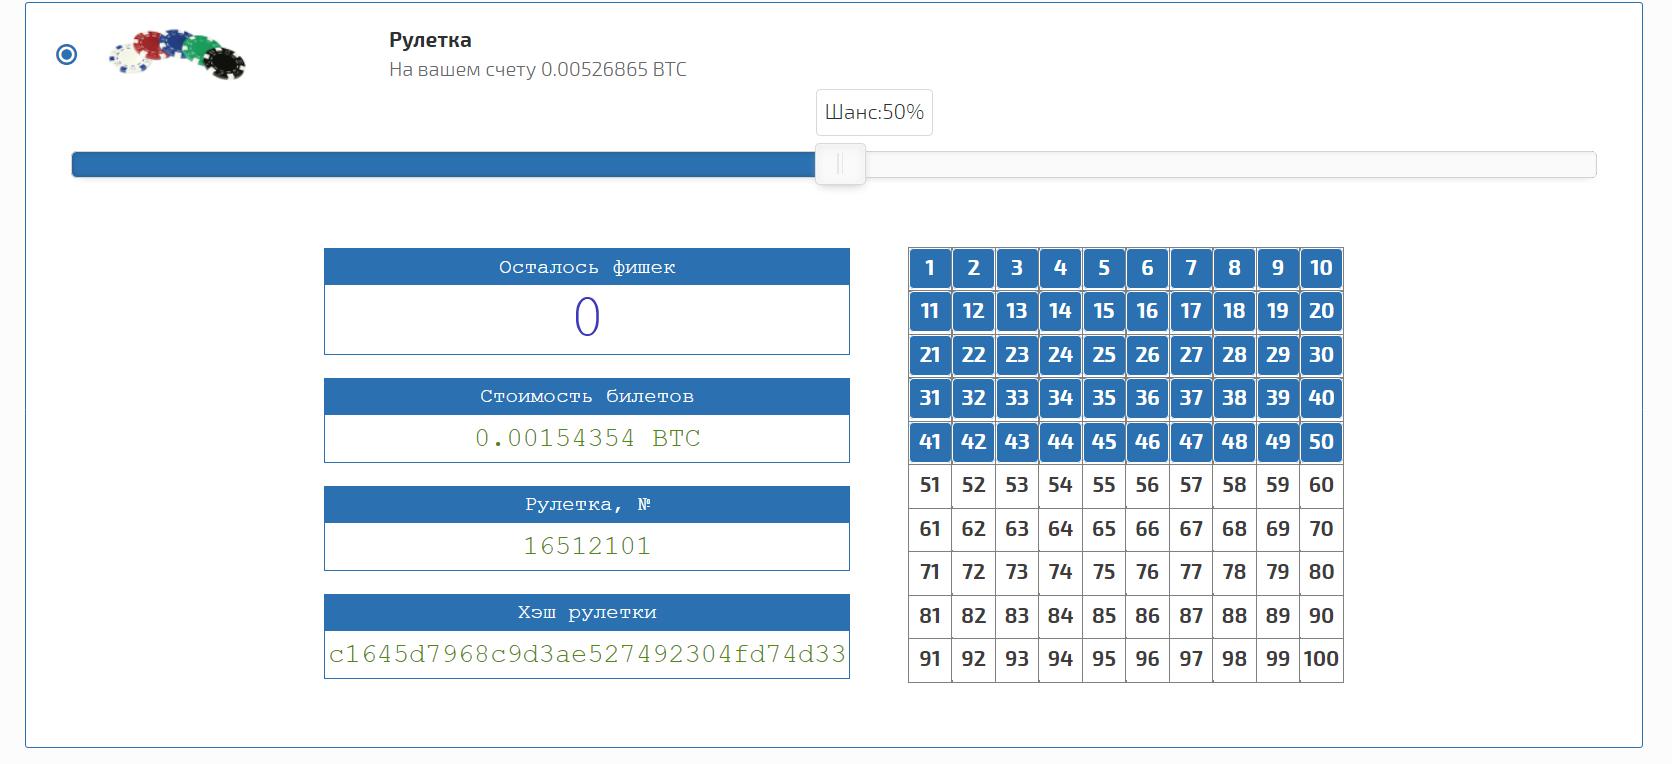 25bfda84615d0f8494ba4 - Рулетка при заказе на HYDRA – правила и подробности работы.